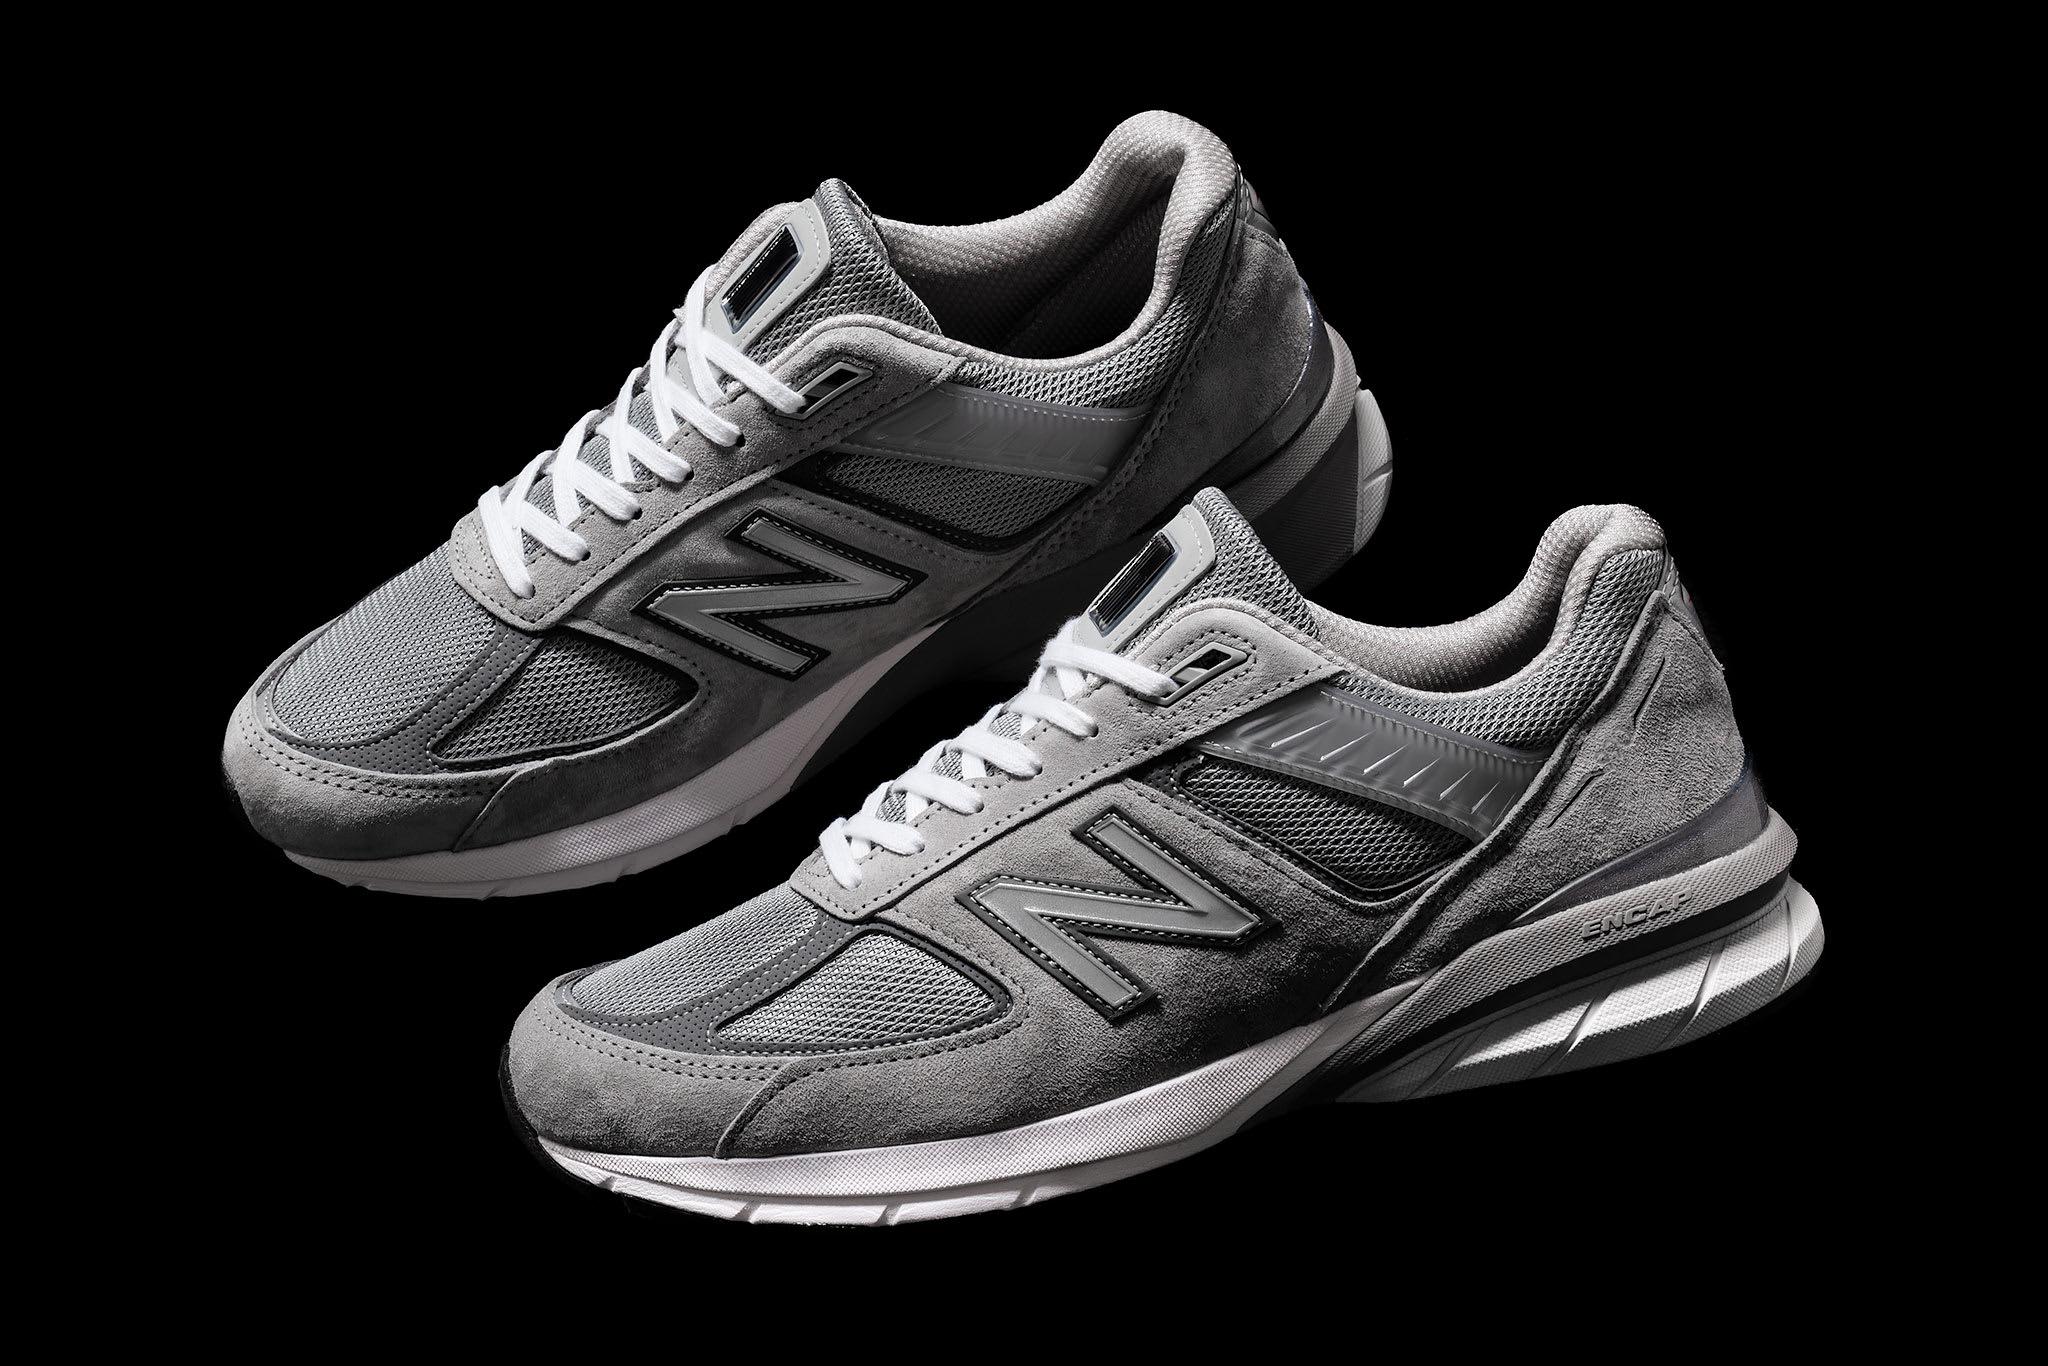 new balance 997 v5